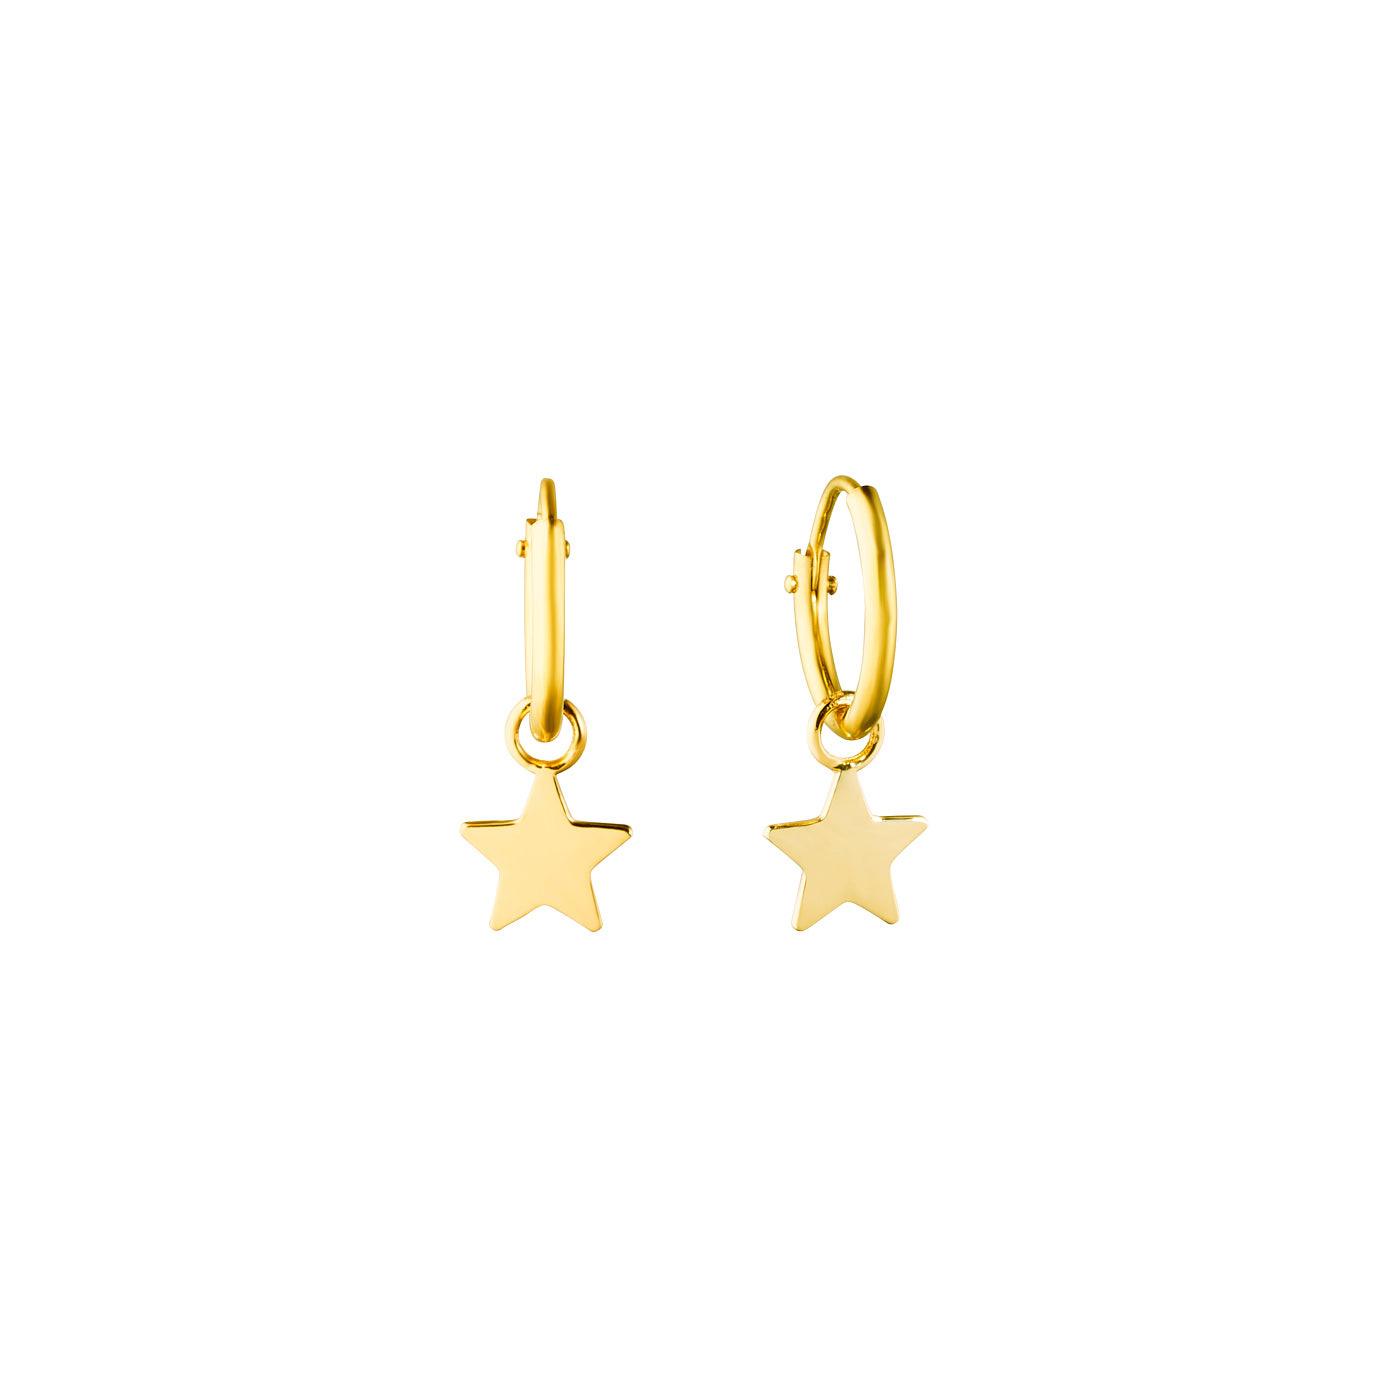 Isabel Bernard Le Marais Anne-Blandine 14 carat golden earrings star